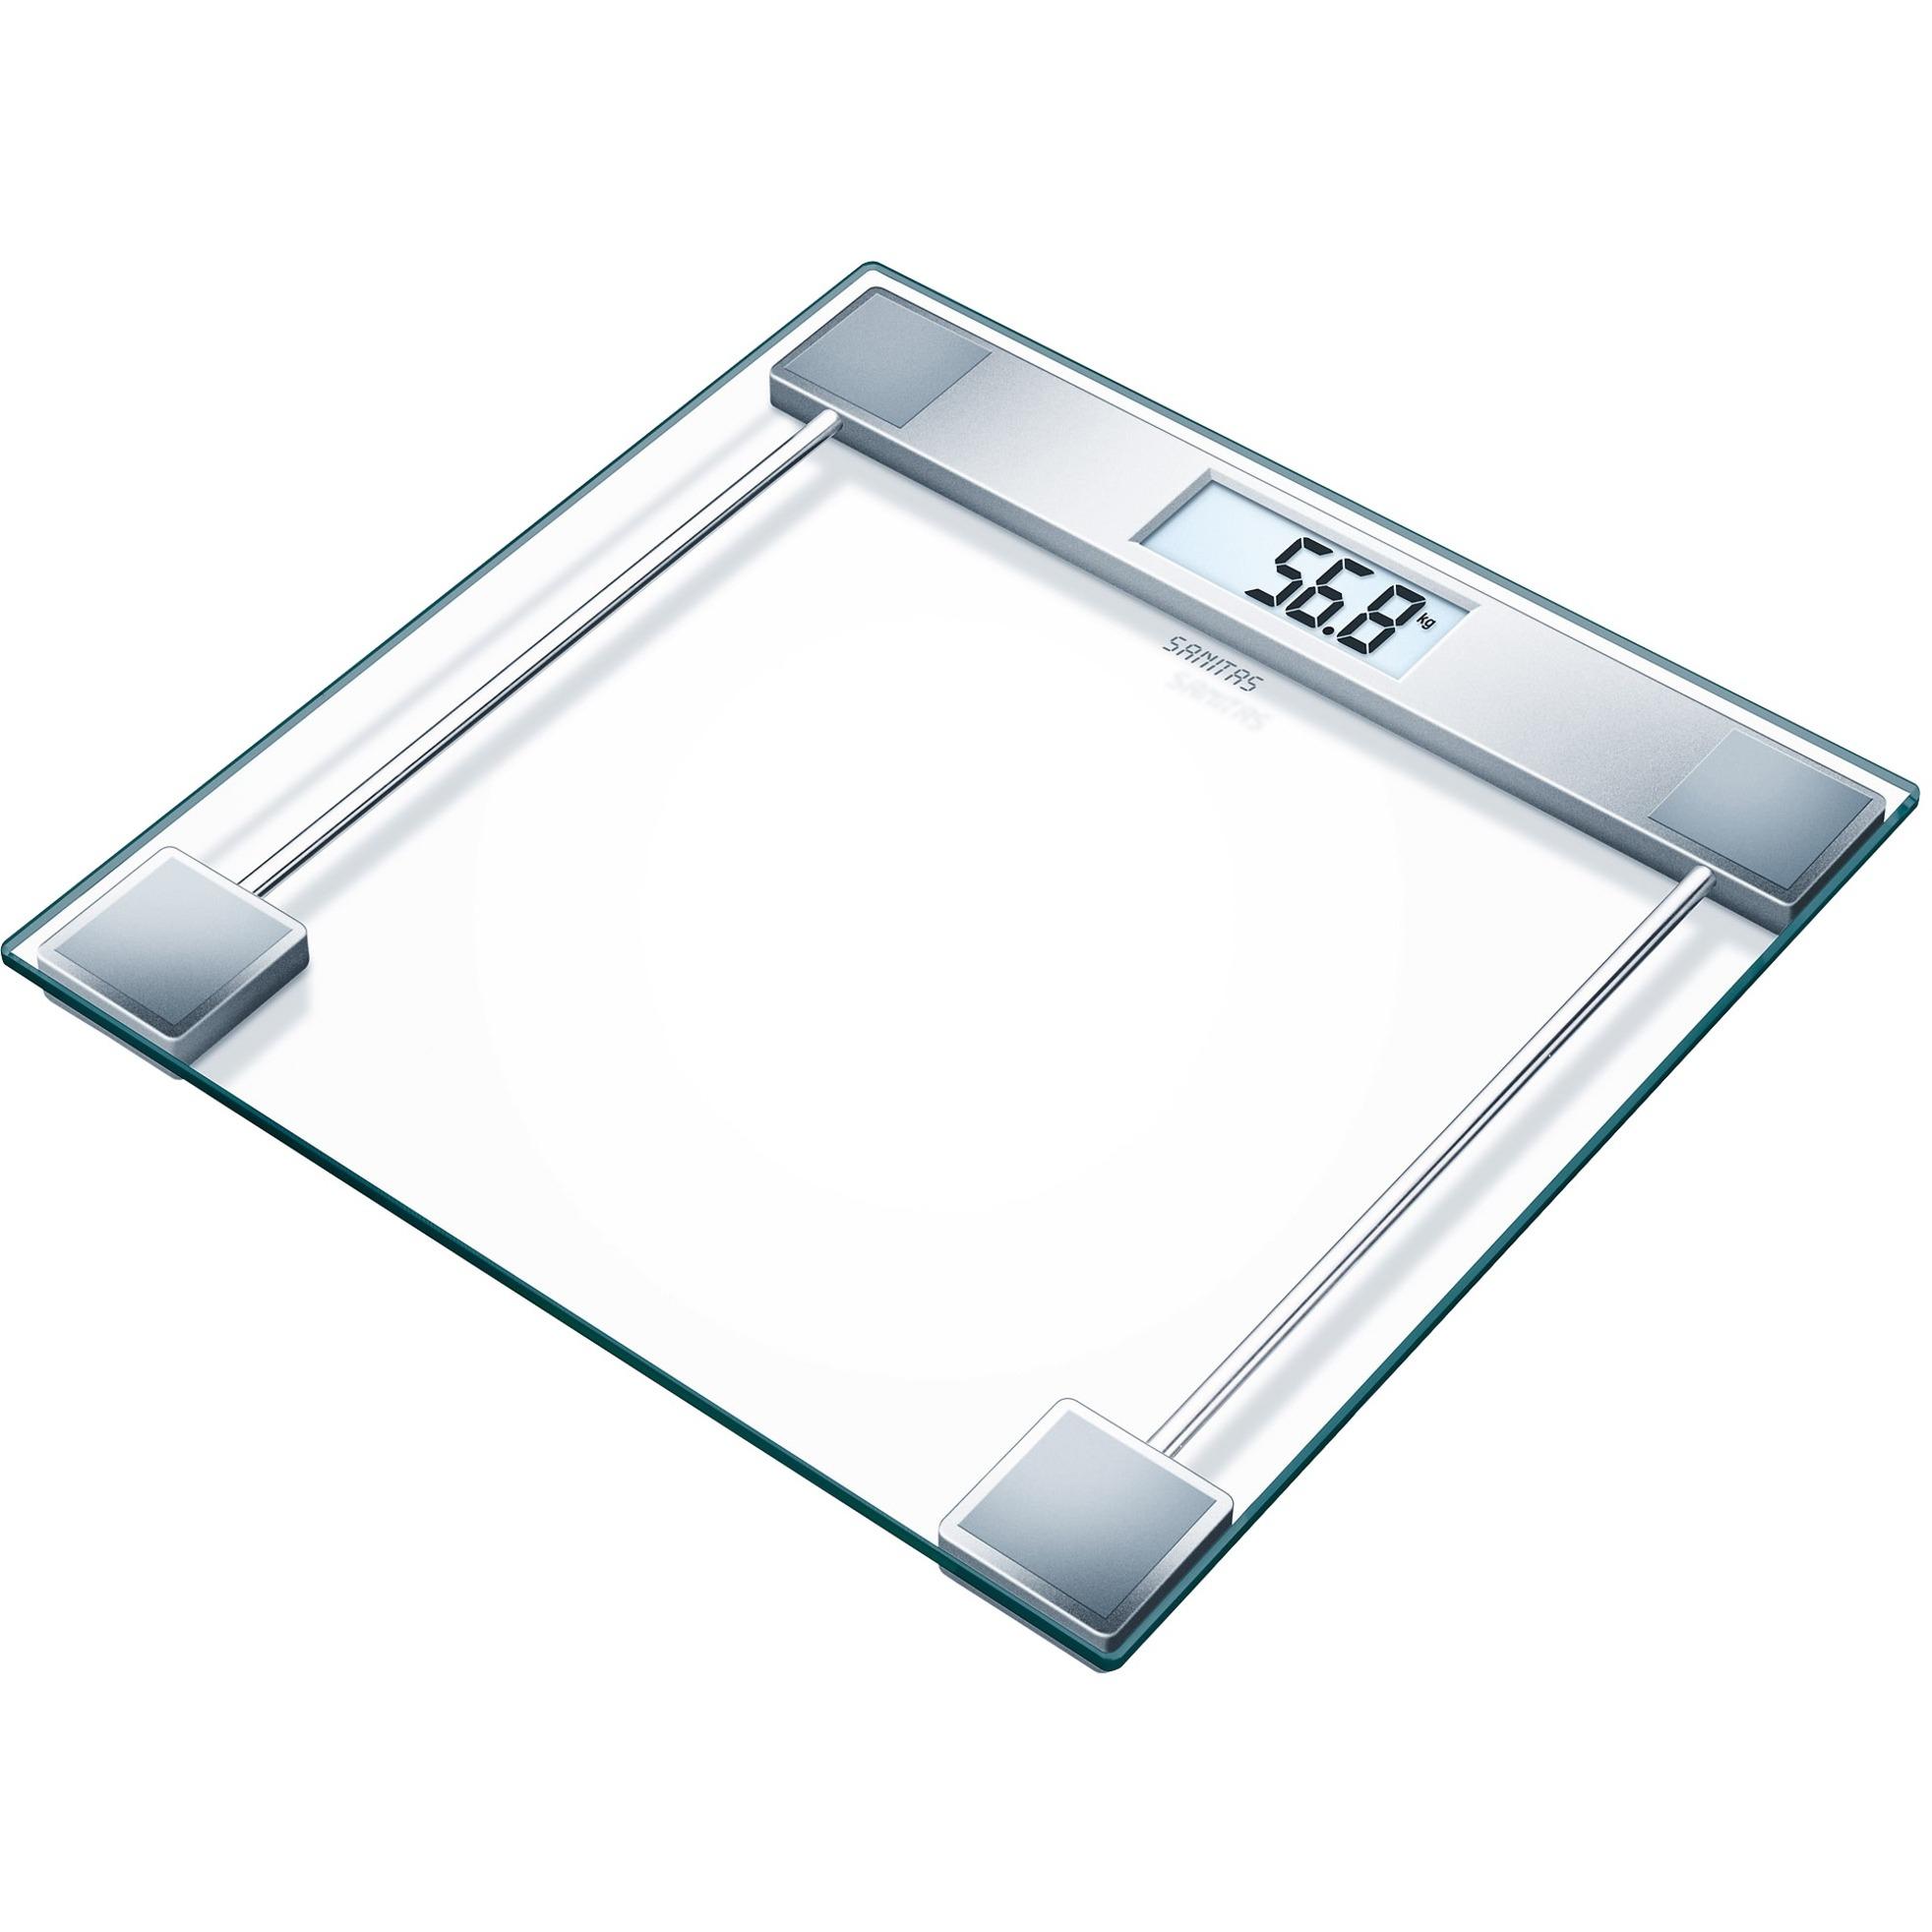 SGS 06 Báscula personal electrónica Plata, Transparente, Balanza